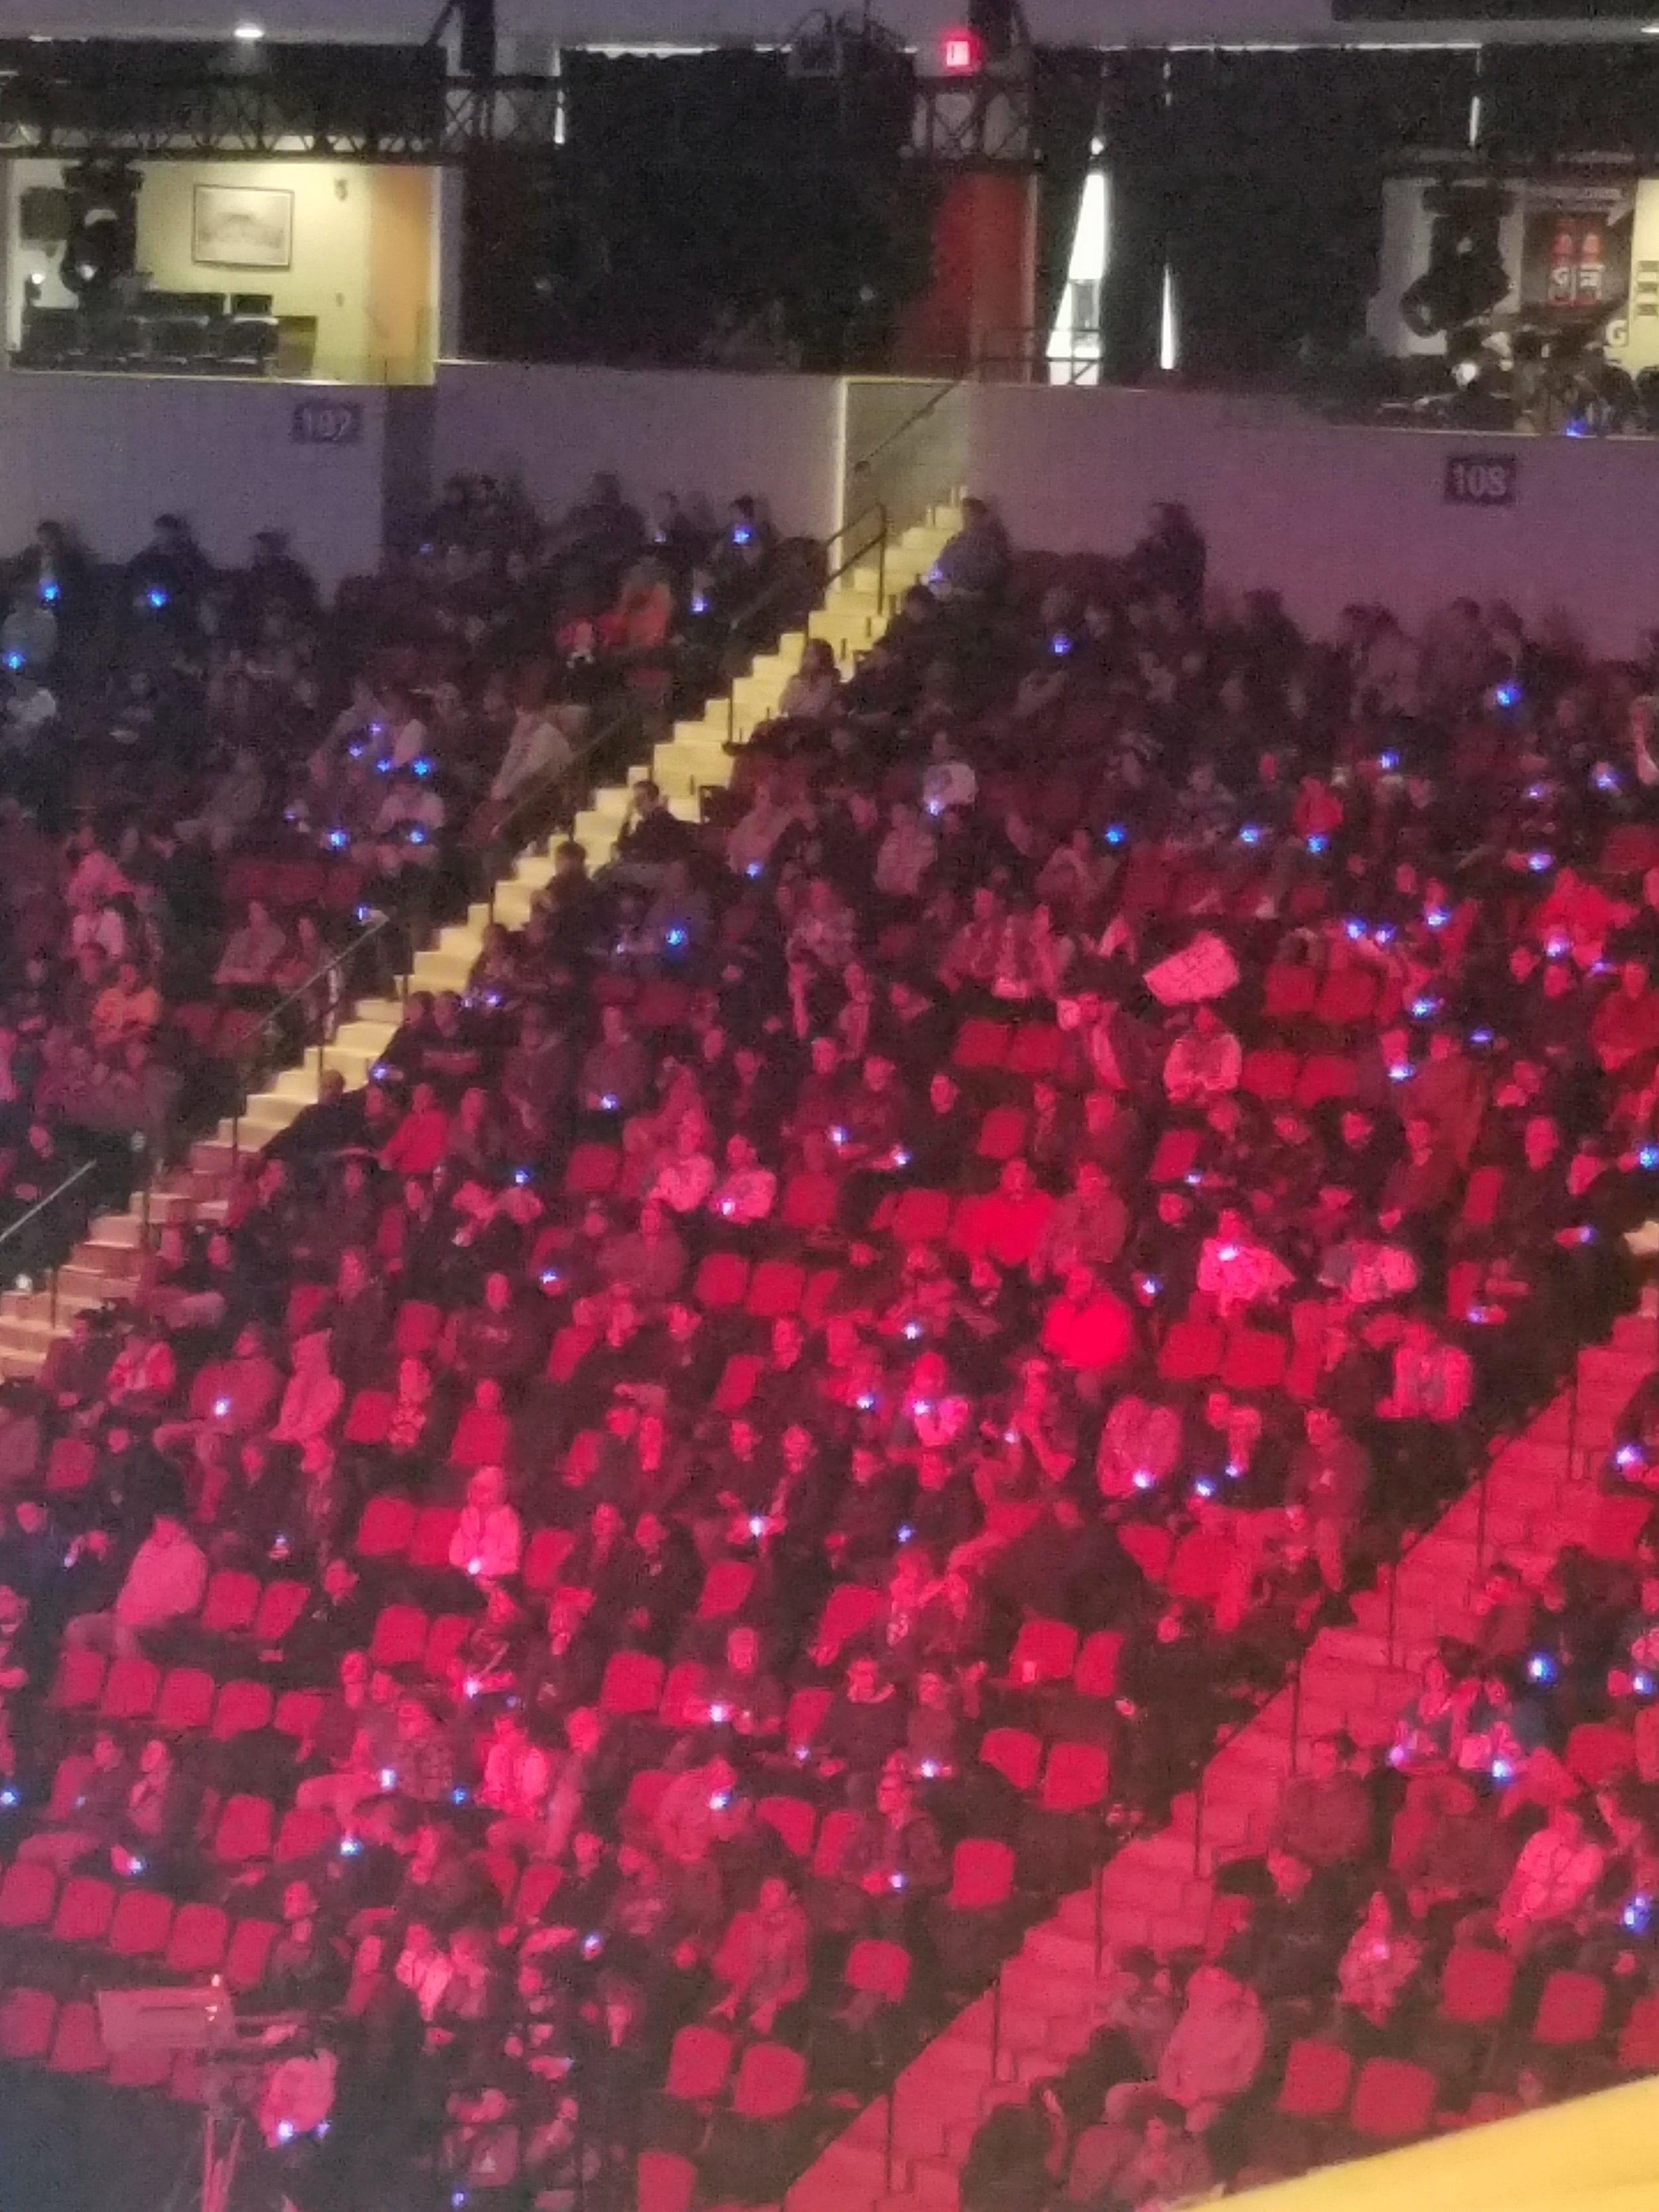 crowd lights up.jpg